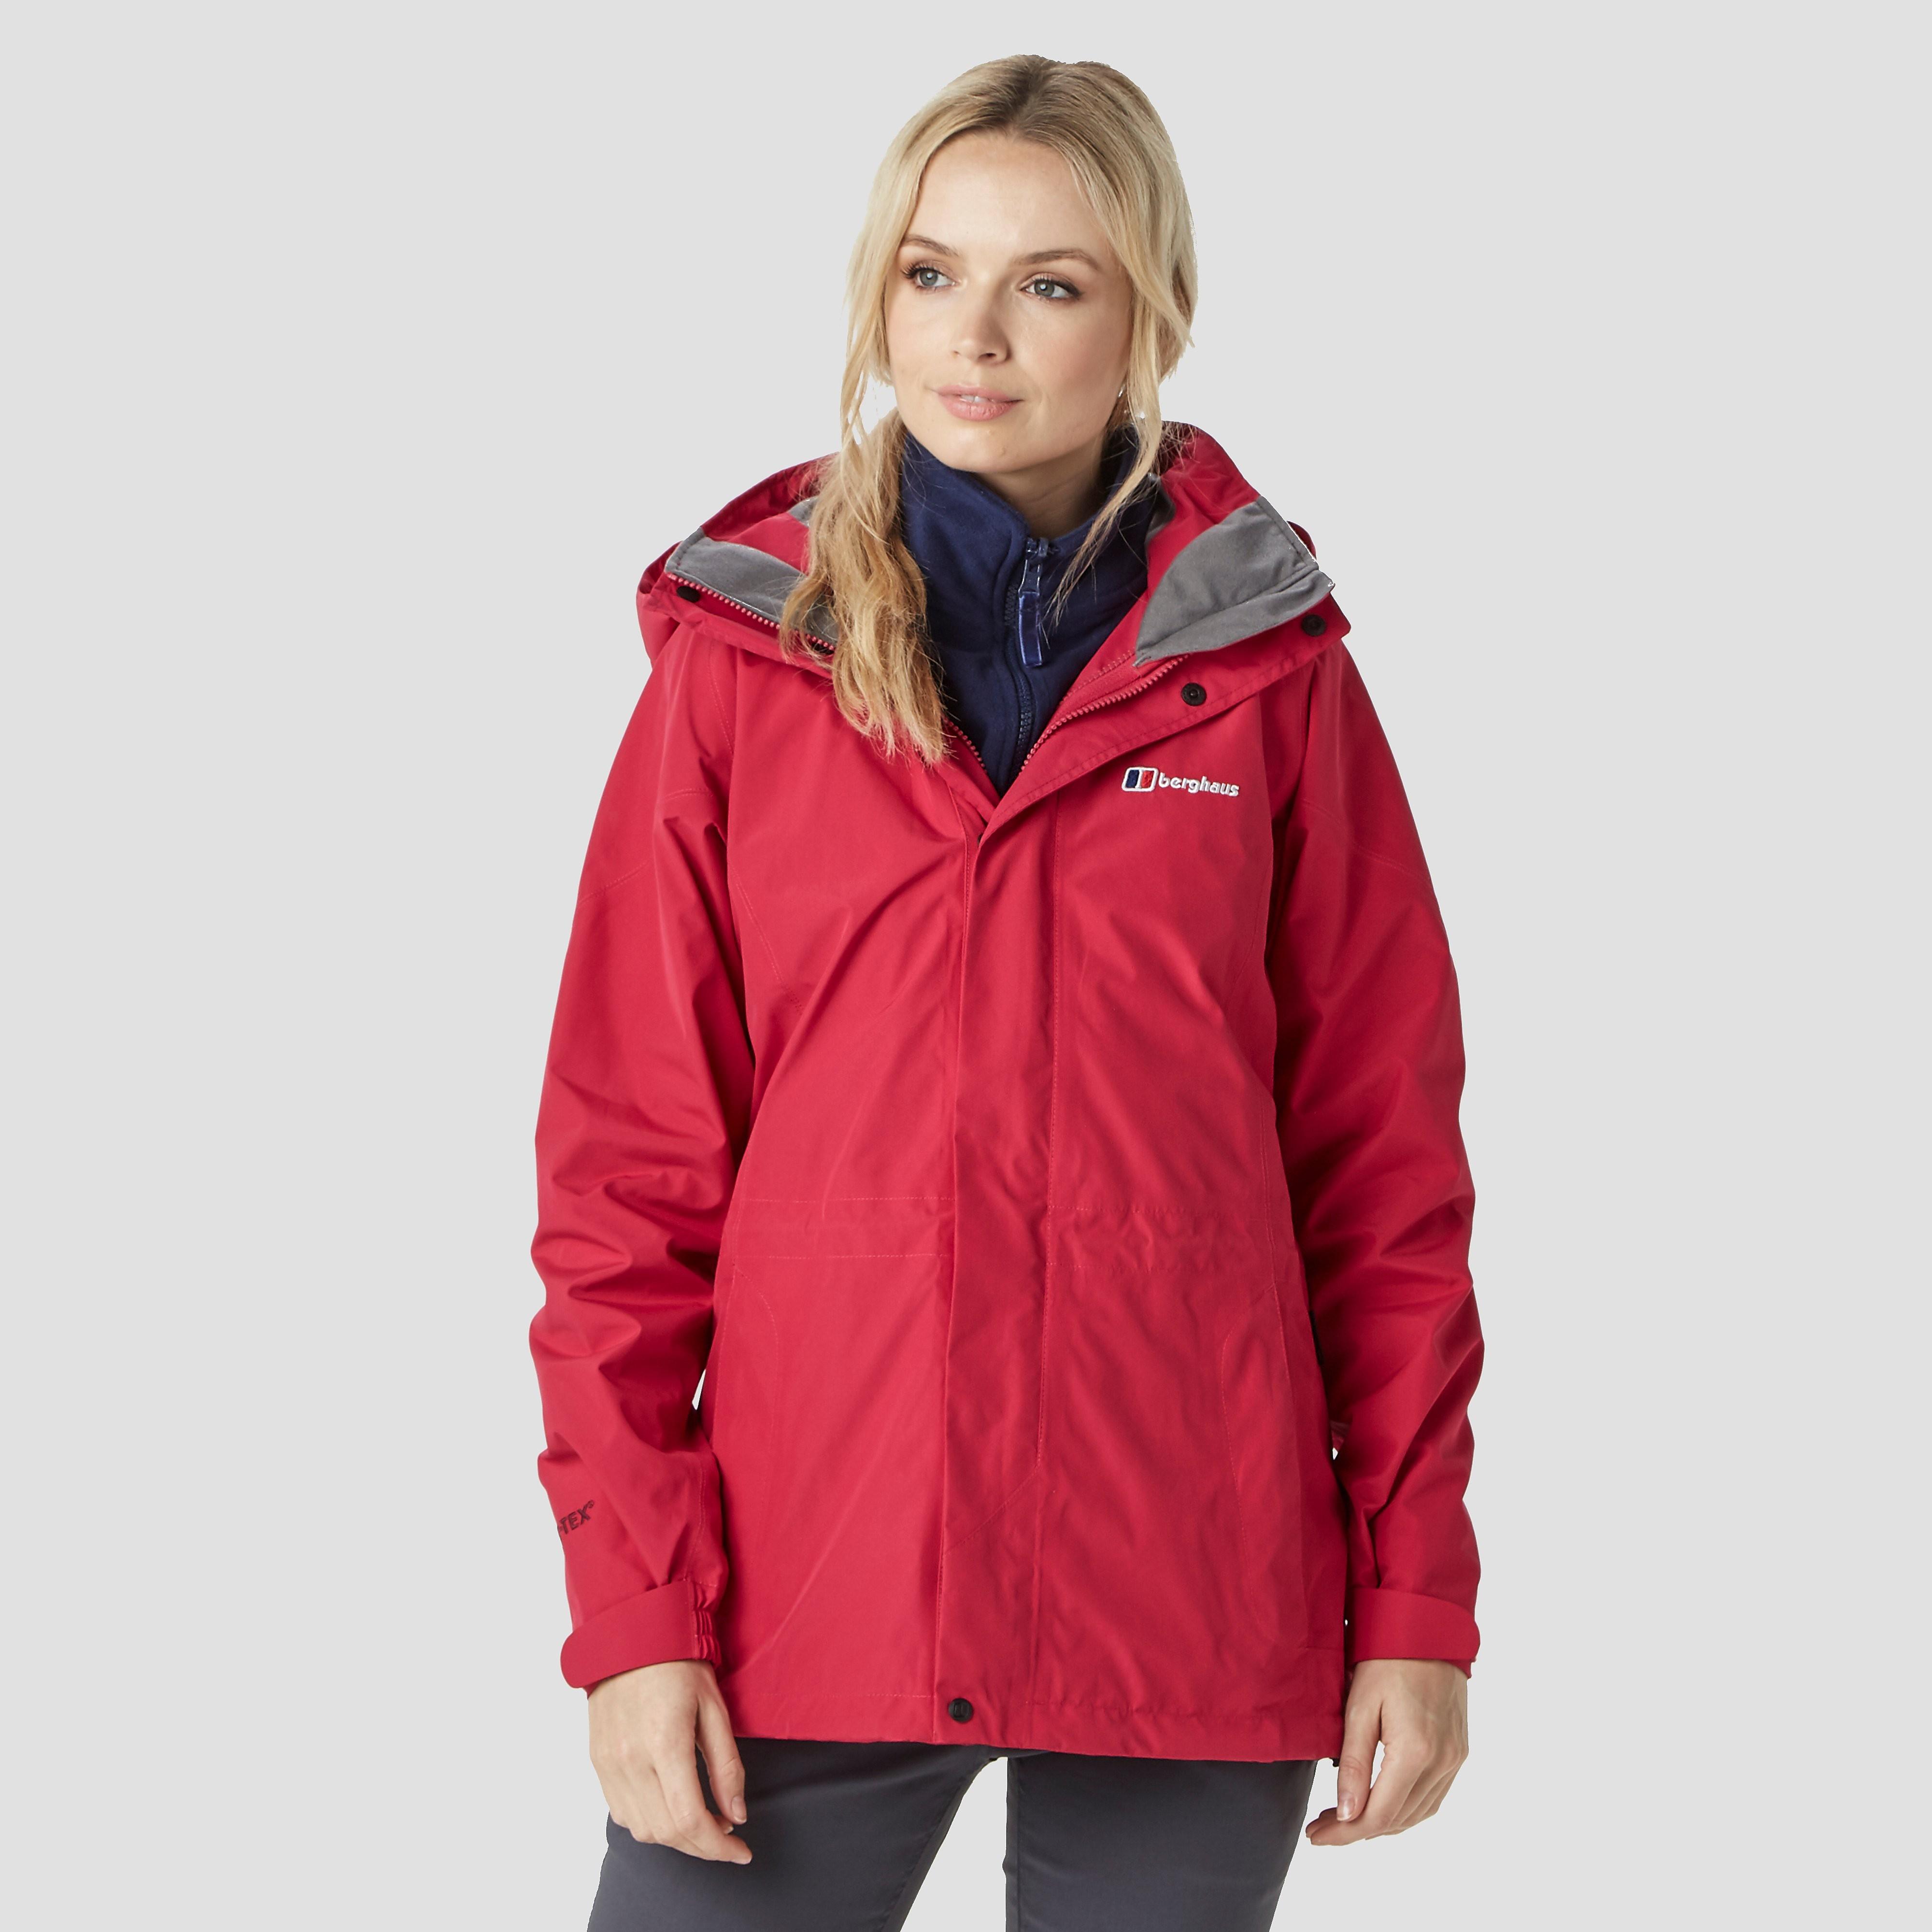 Berghaus Women's Glissade Jacket